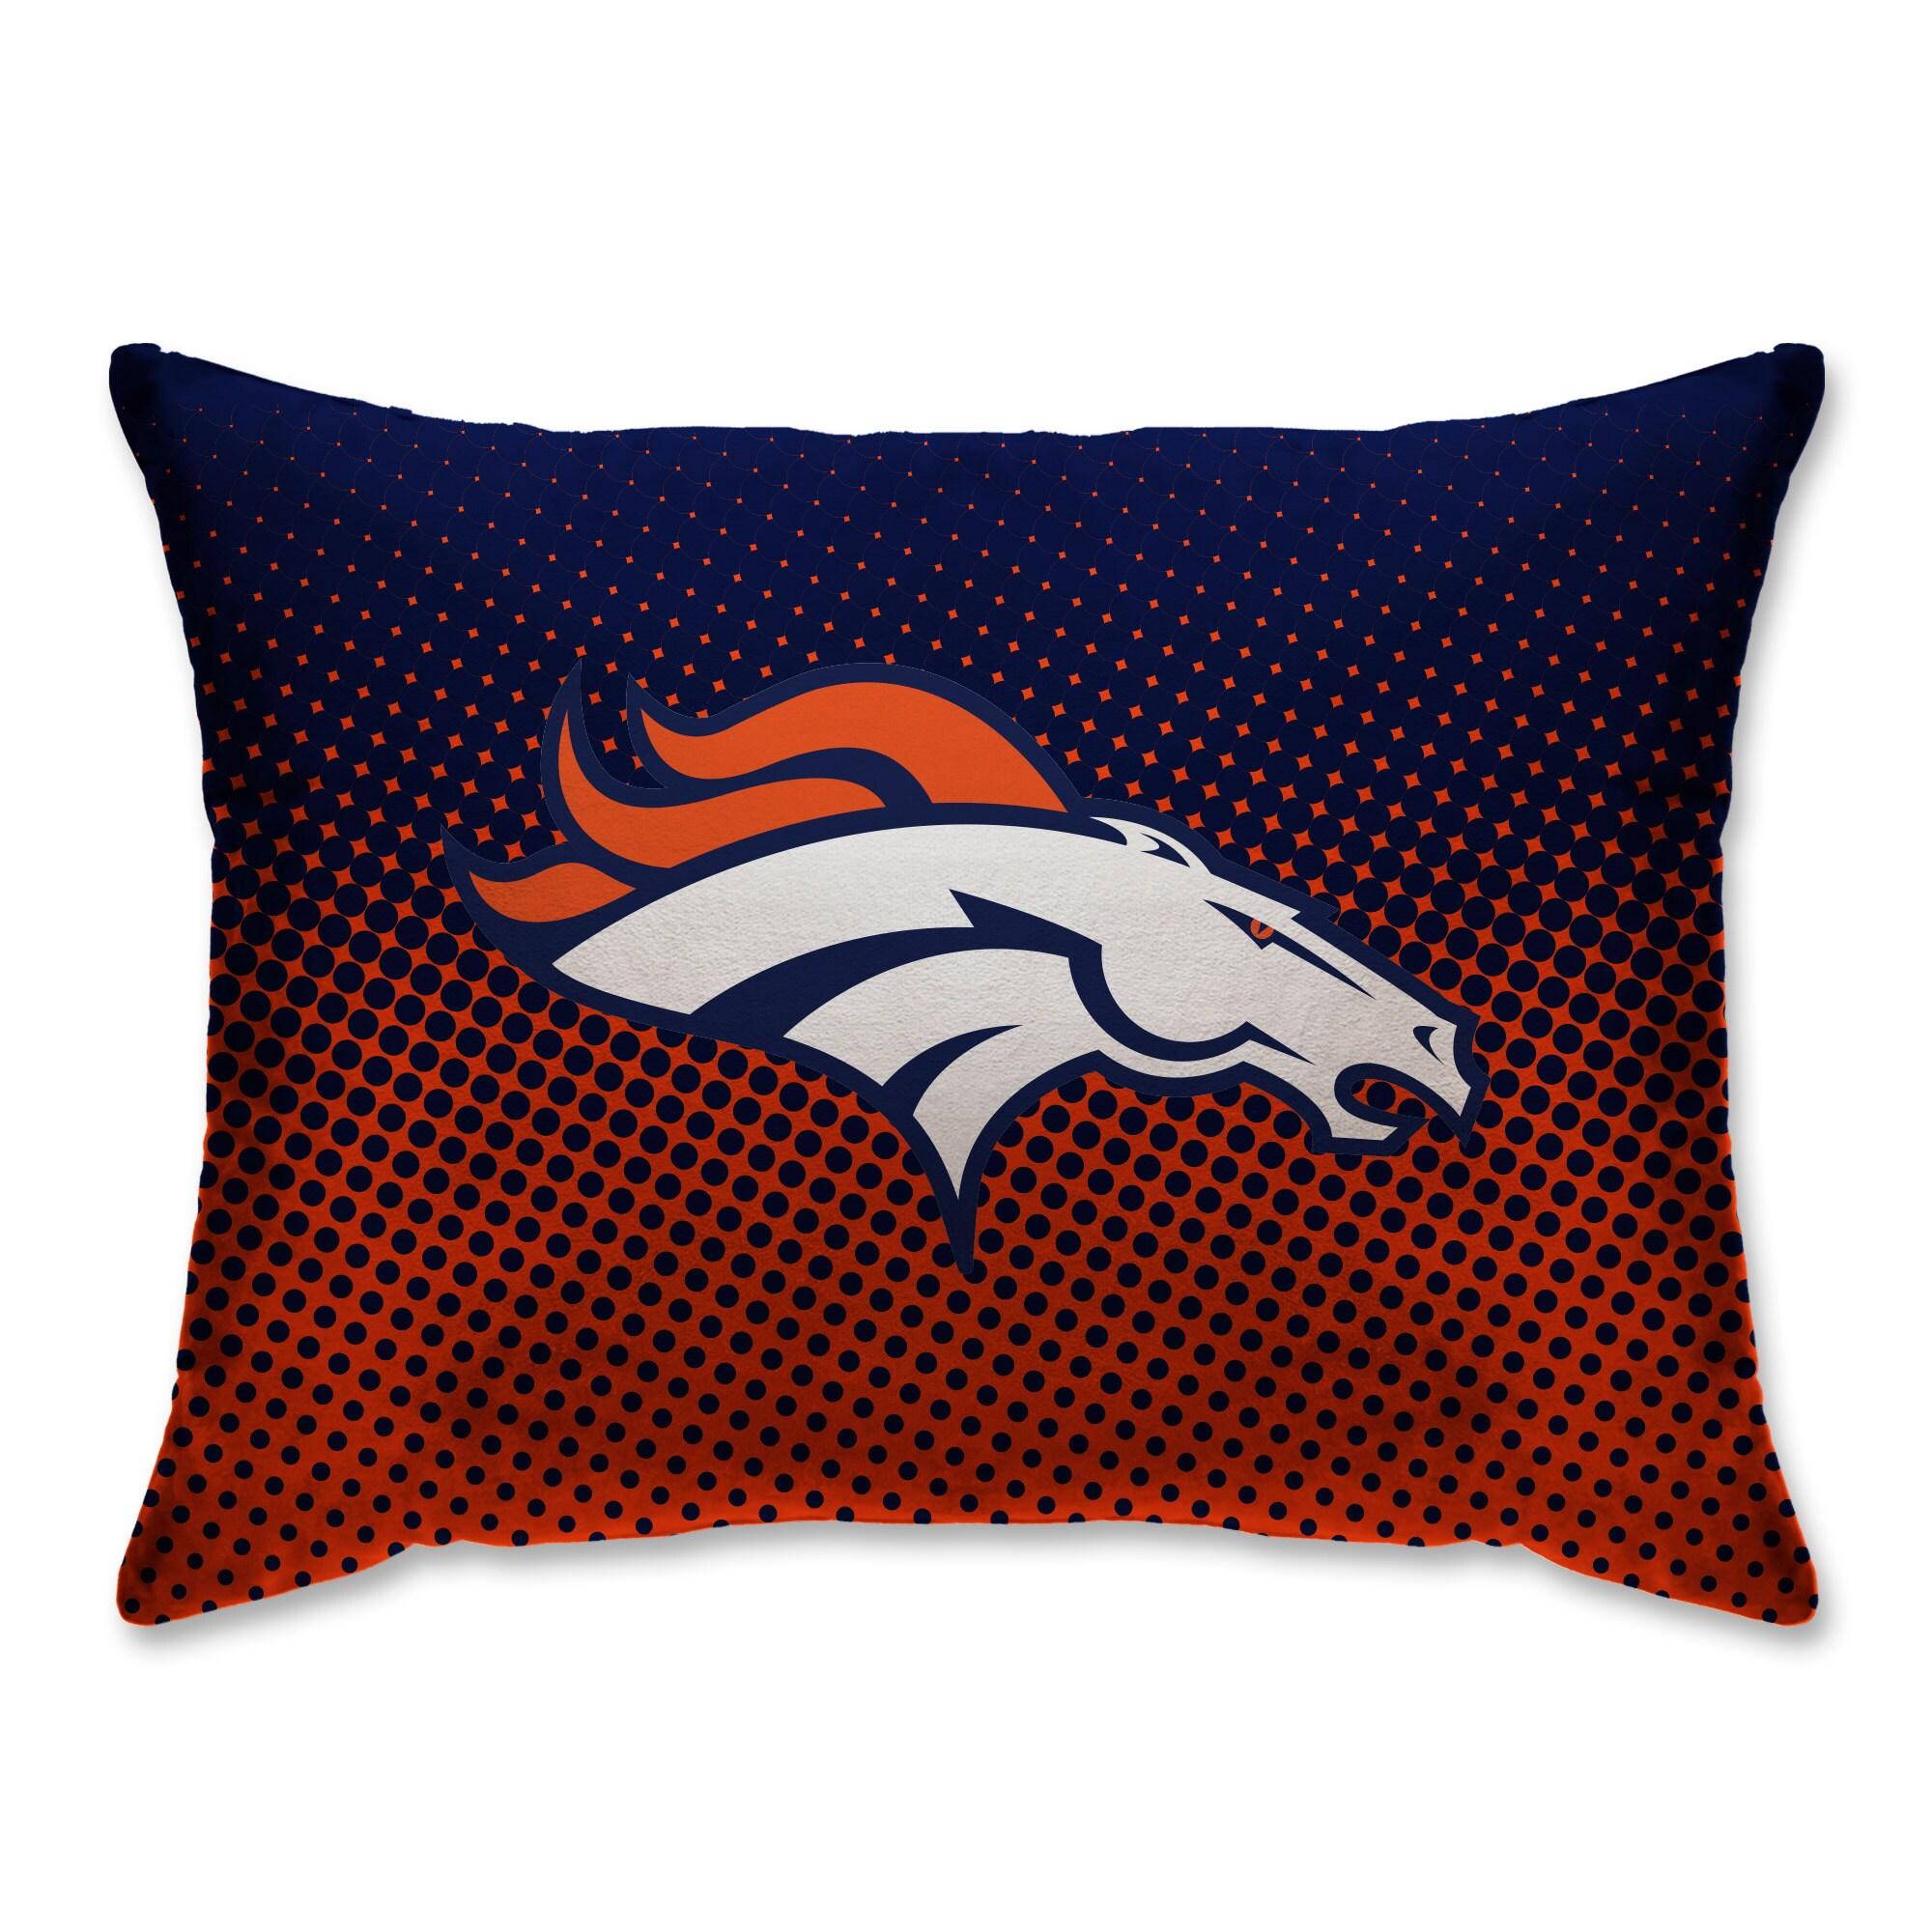 "Denver Broncos 20"" x 26"" Dot Decorative Bed Pillow"